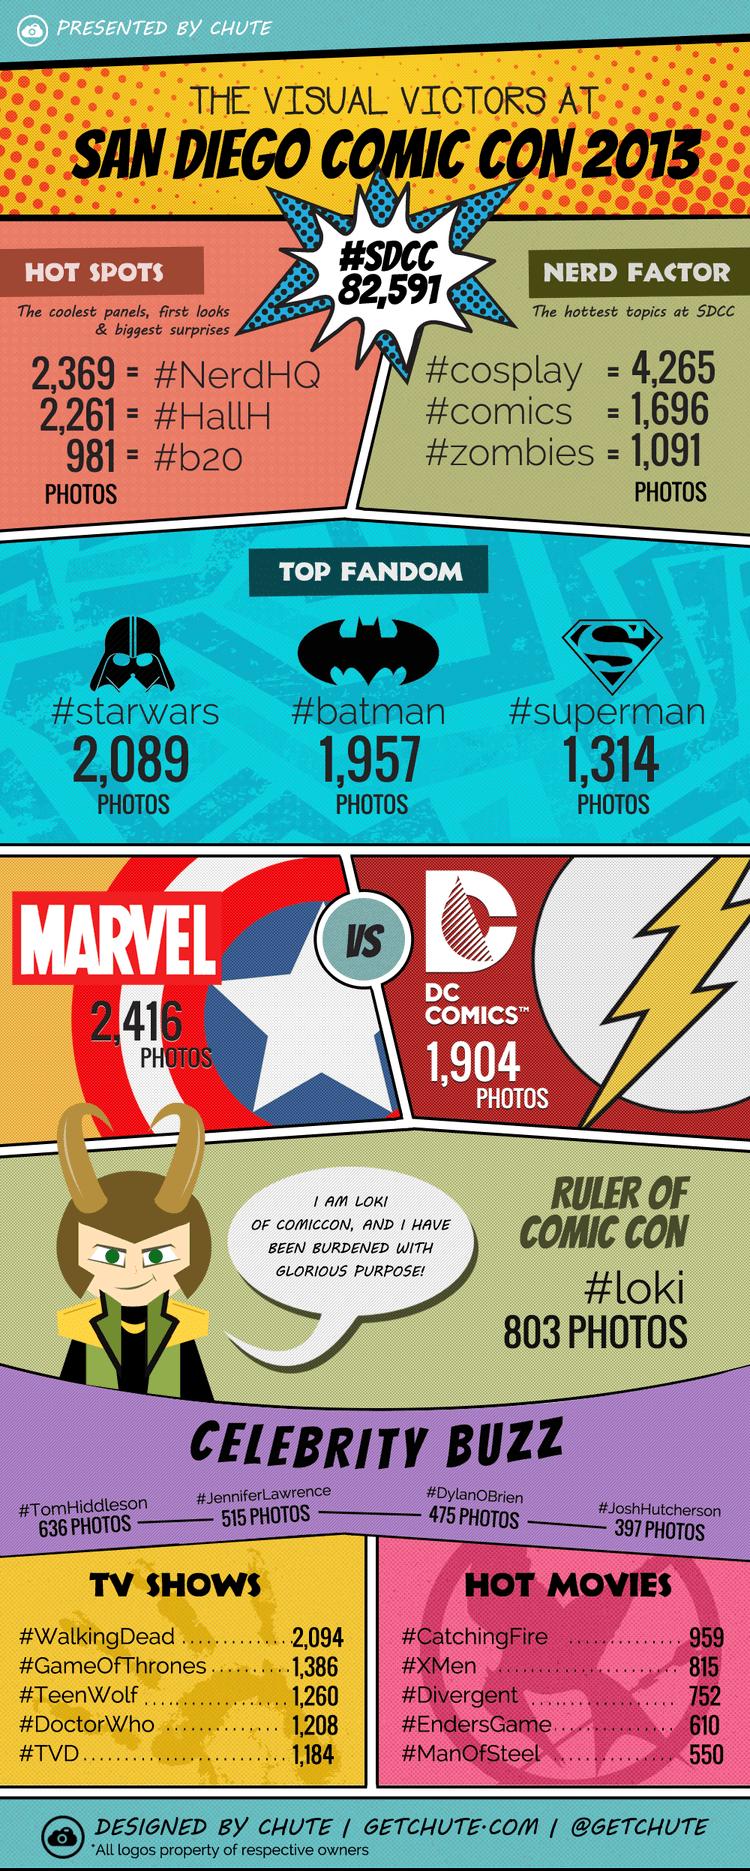 Comic-Con 2013 Infographic